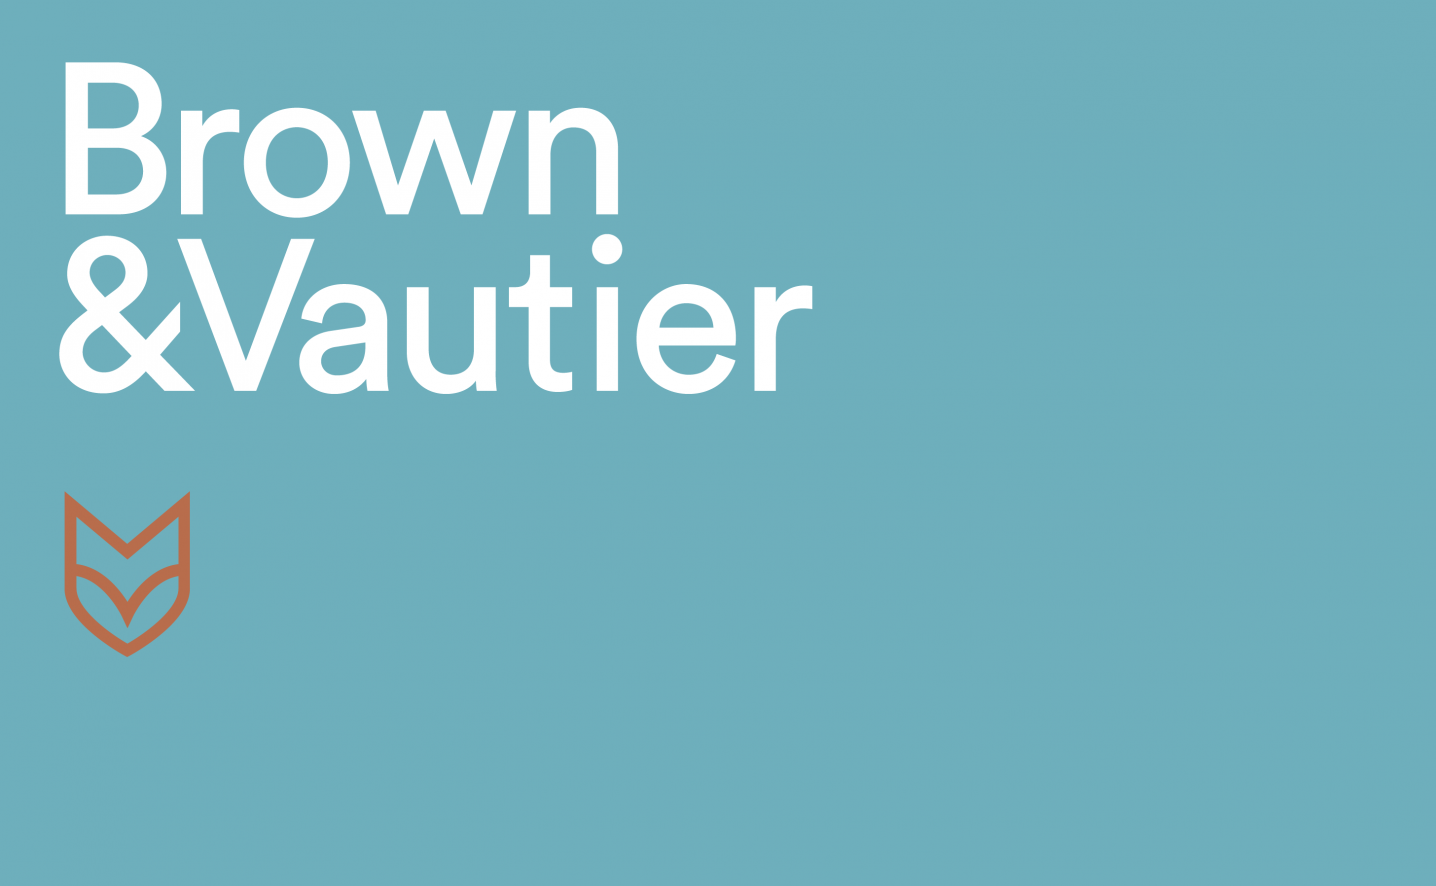 Brown & Vautier Logo design by Ascend Studio